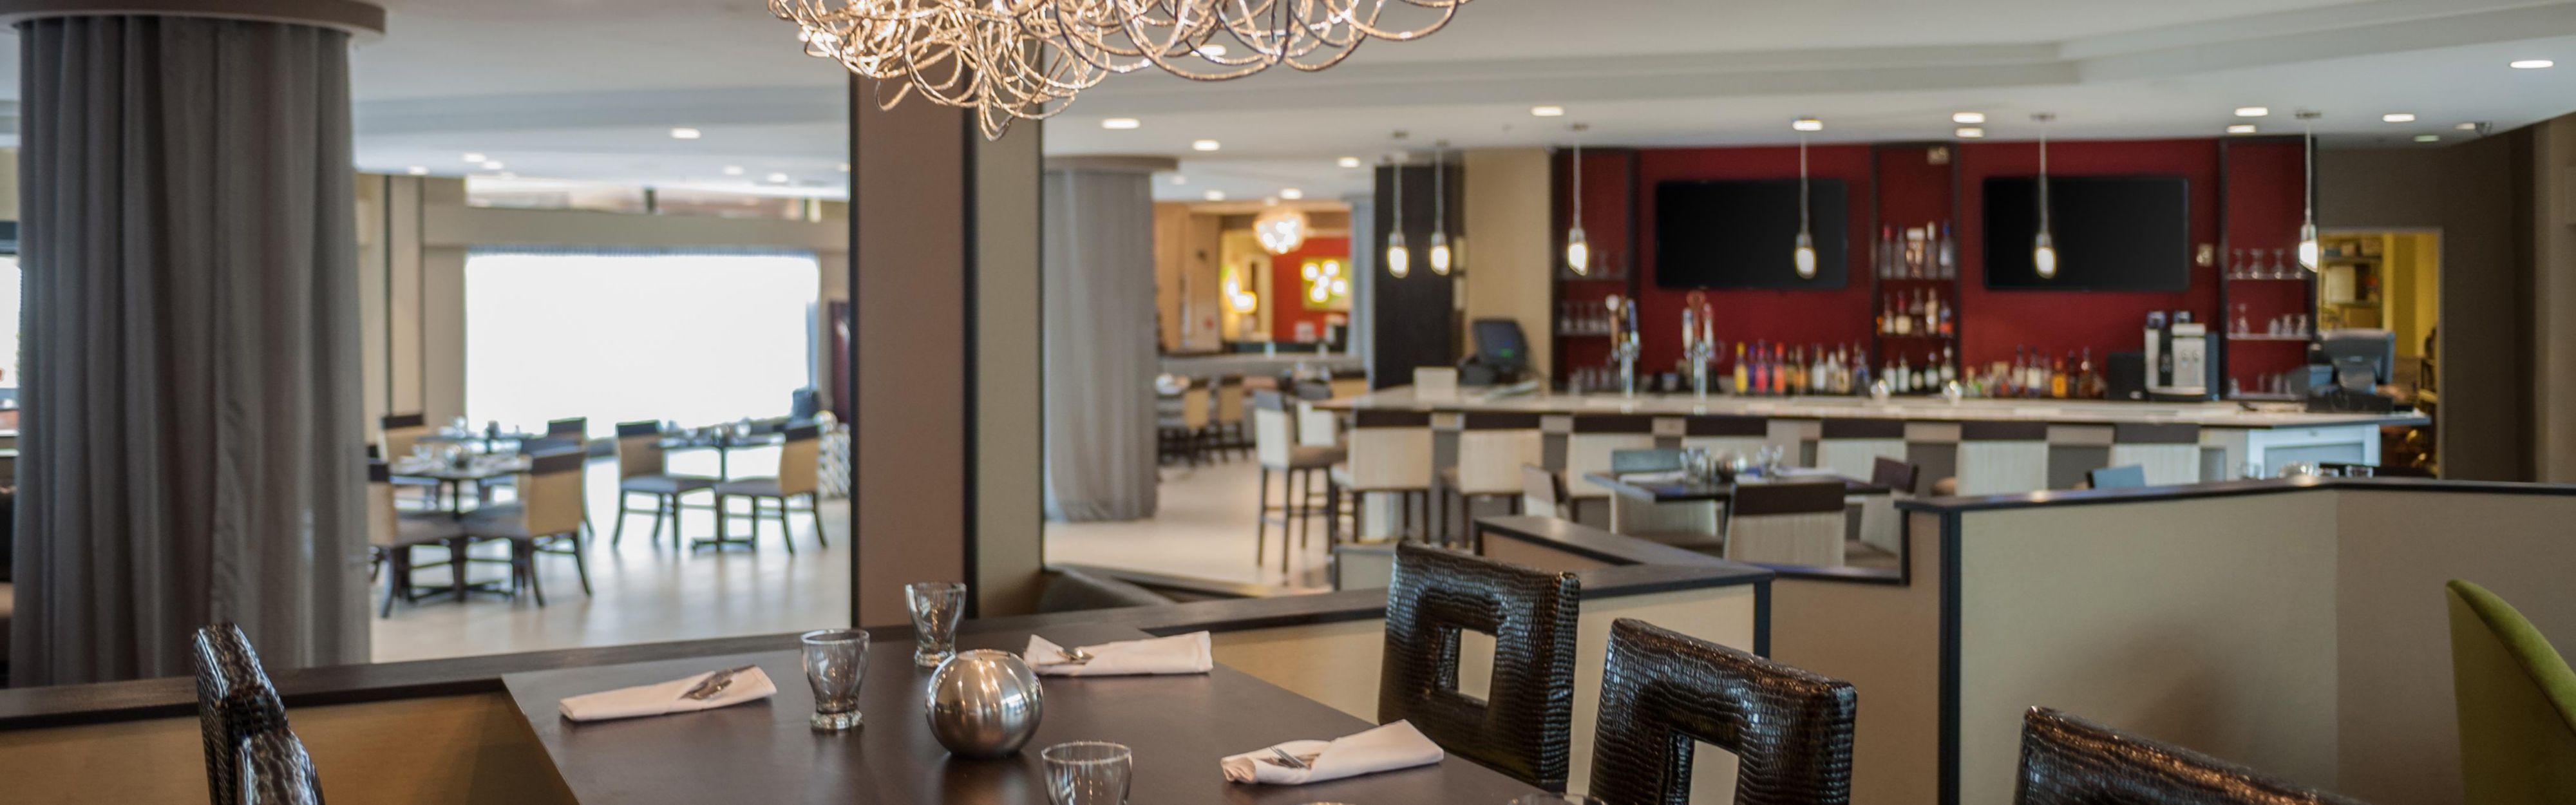 Holiday Inn Bensalem-Philadelphia Area image 3